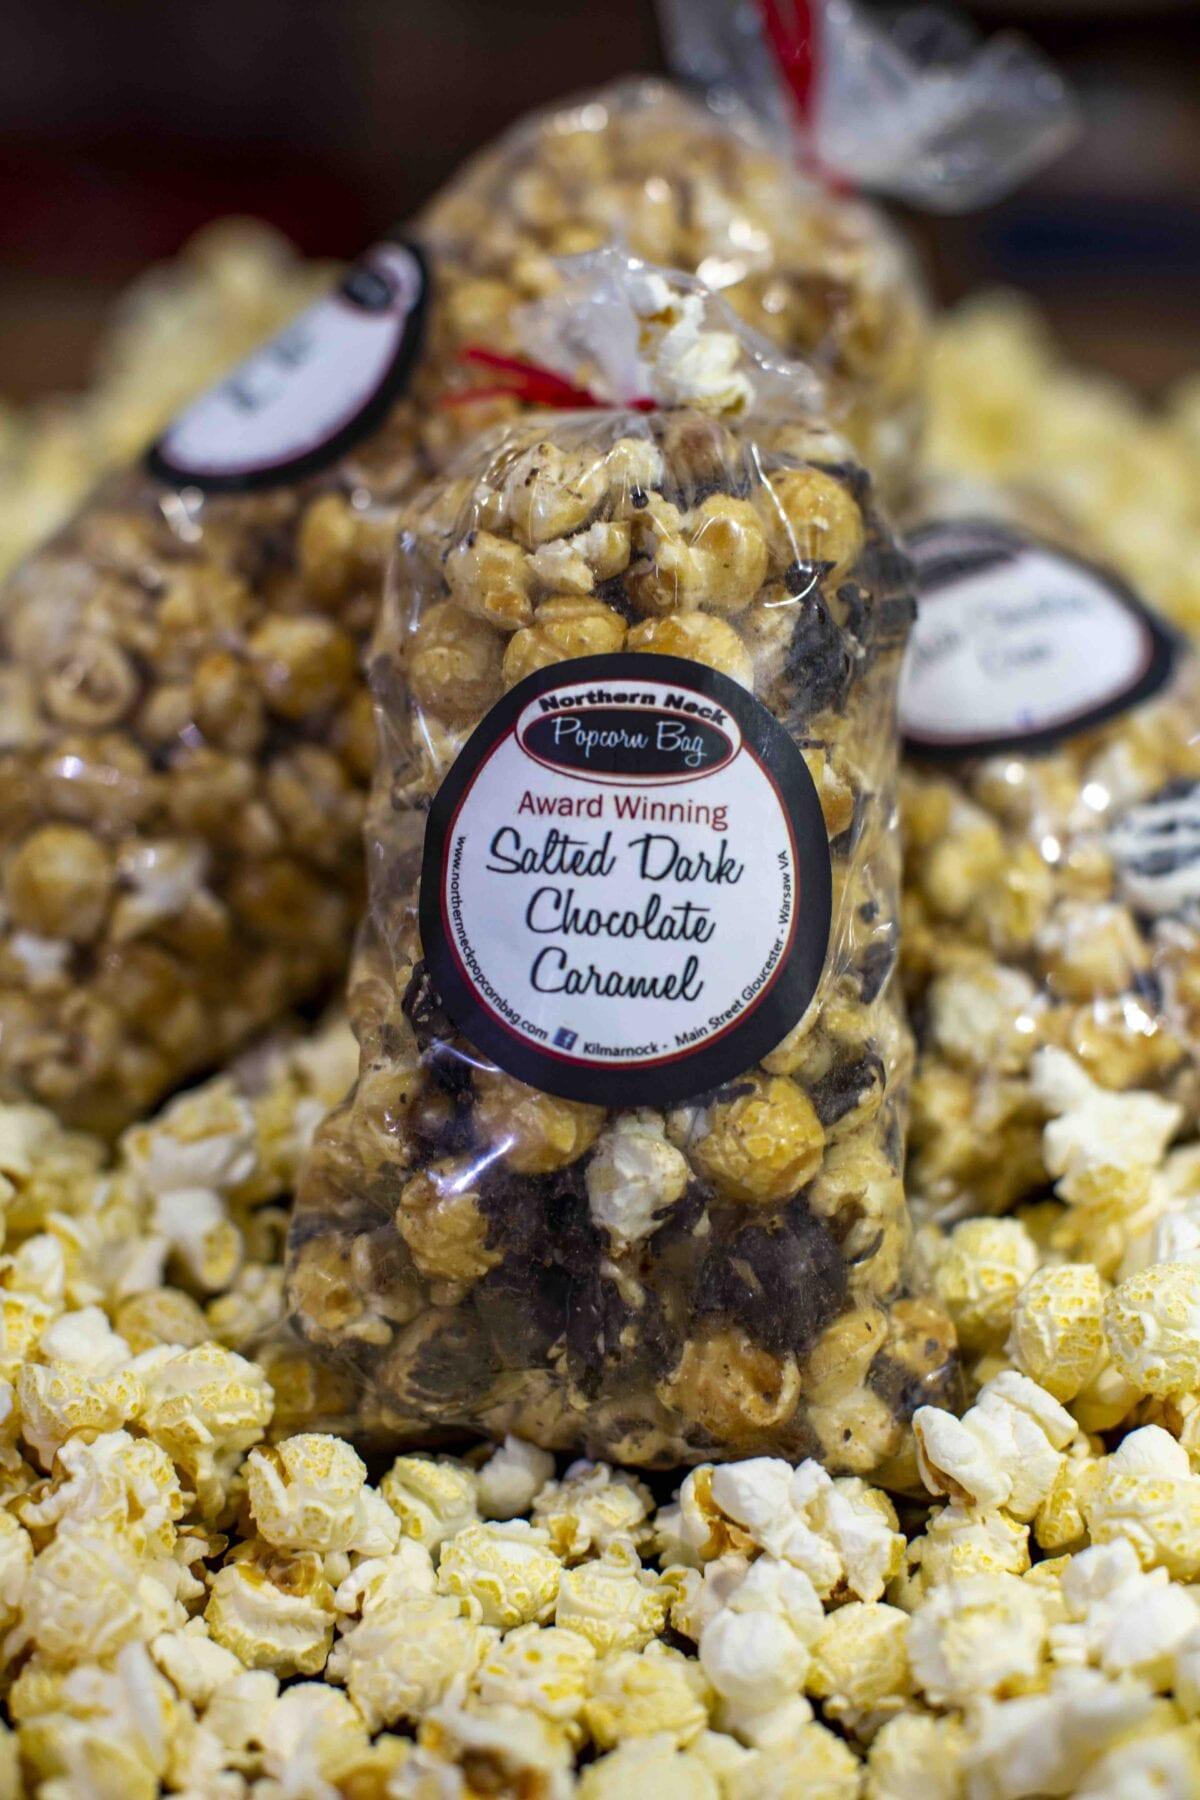 Northern Neck Popcorn Bag Salted Dark Chocolate Caramel